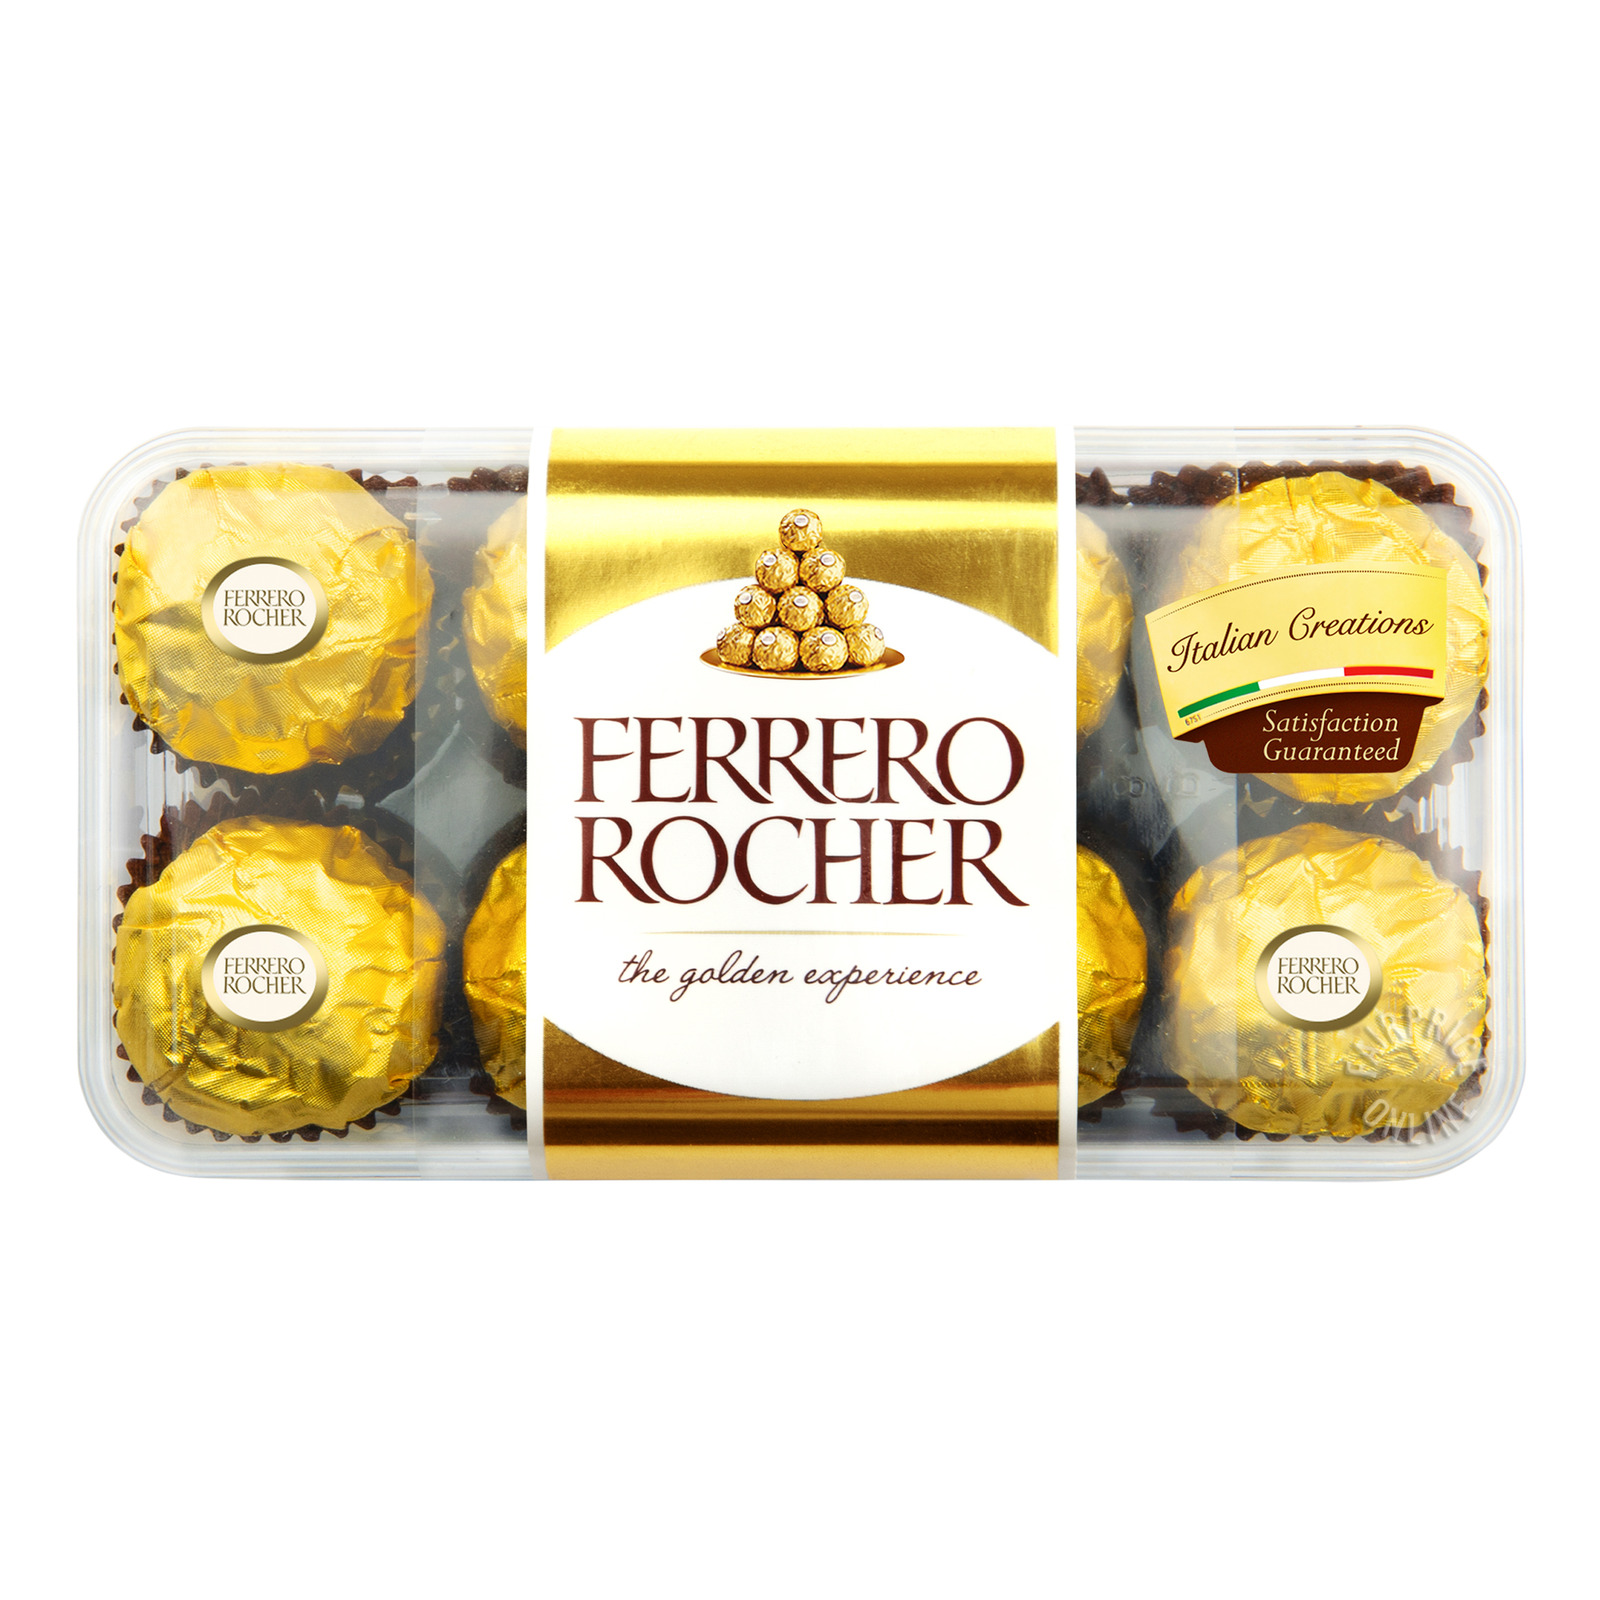 Ferrero Rocher Chocolate - T16